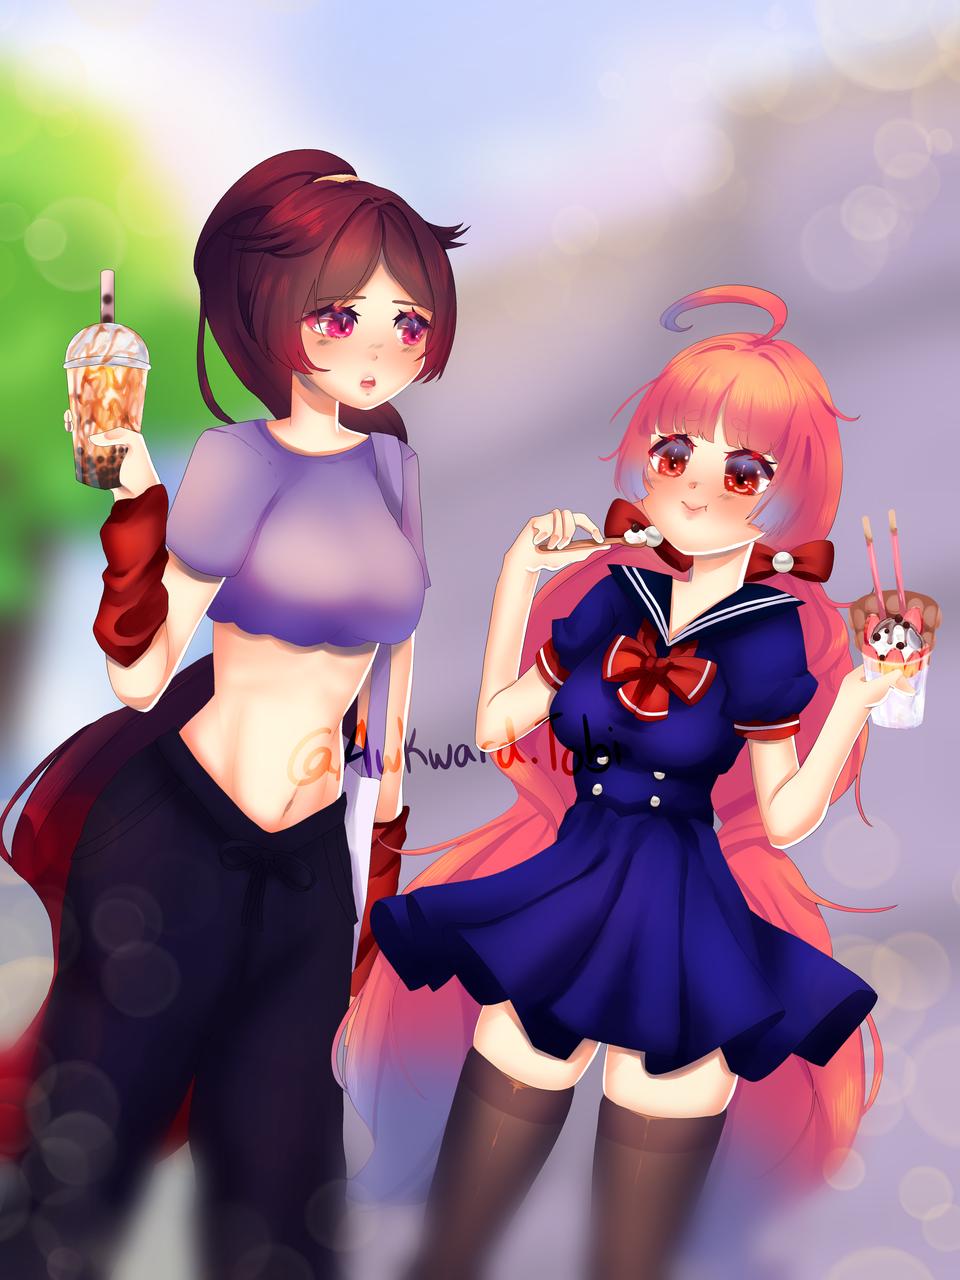 hanging out Illust of AwkwardTobi food illustration Artwork anime eating